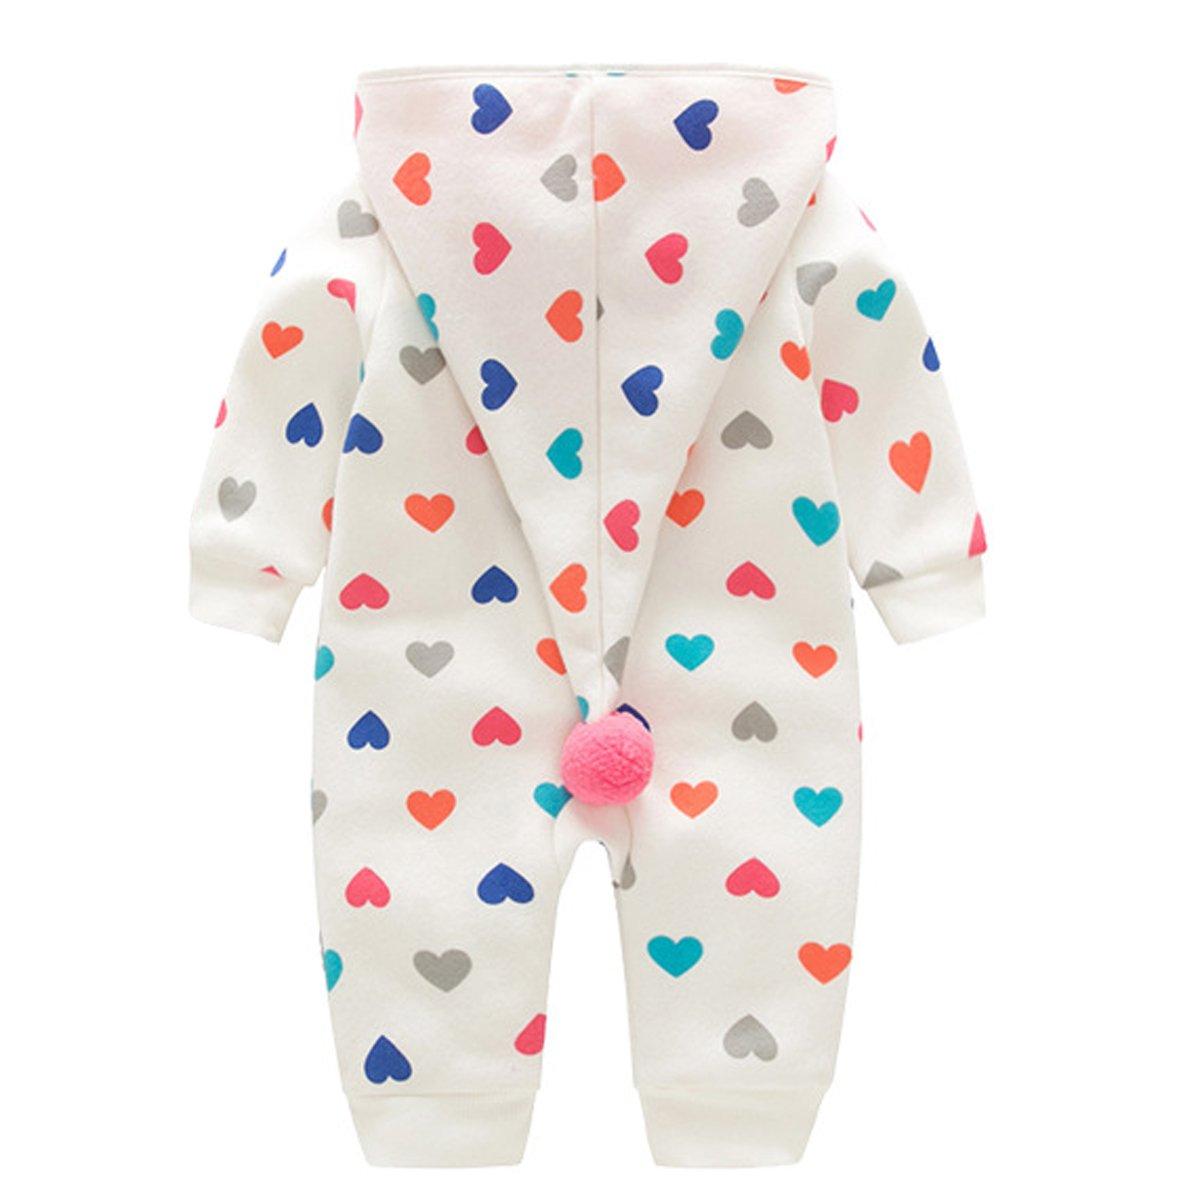 Bebone Baby Strampler Jungen M/ädchen Overall Babykleidung